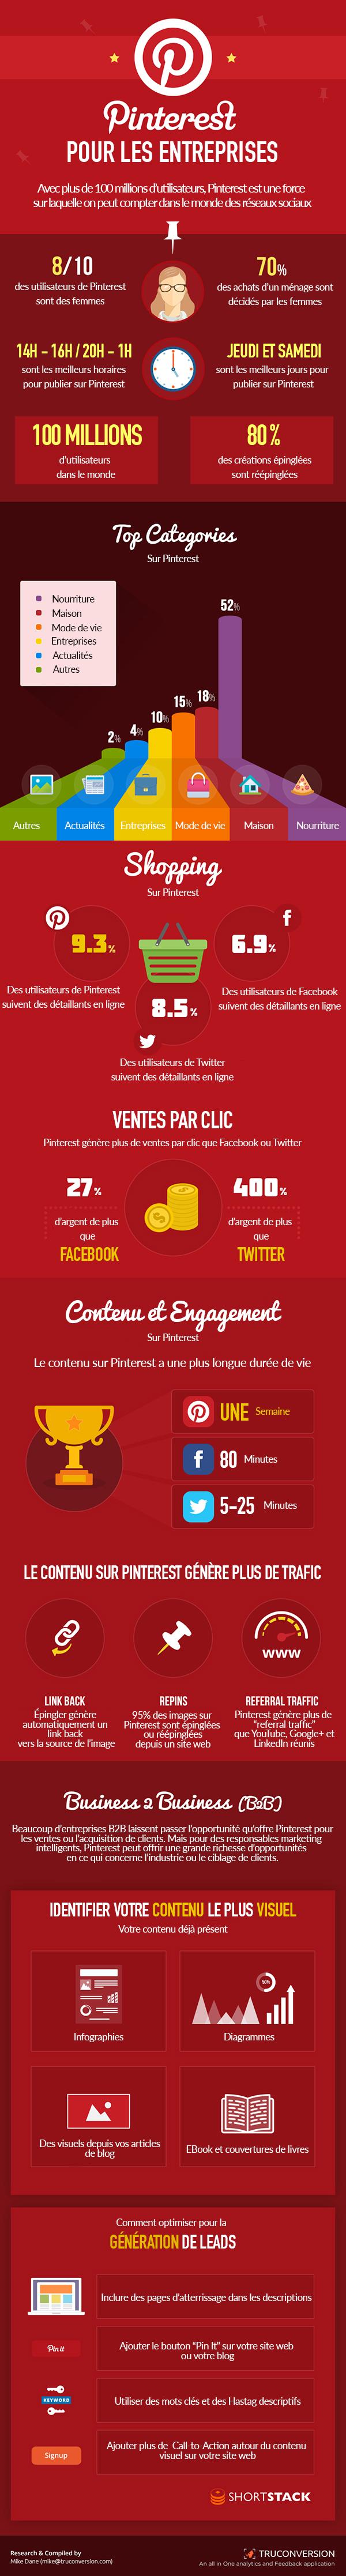 infographie-pinterest-entreprise